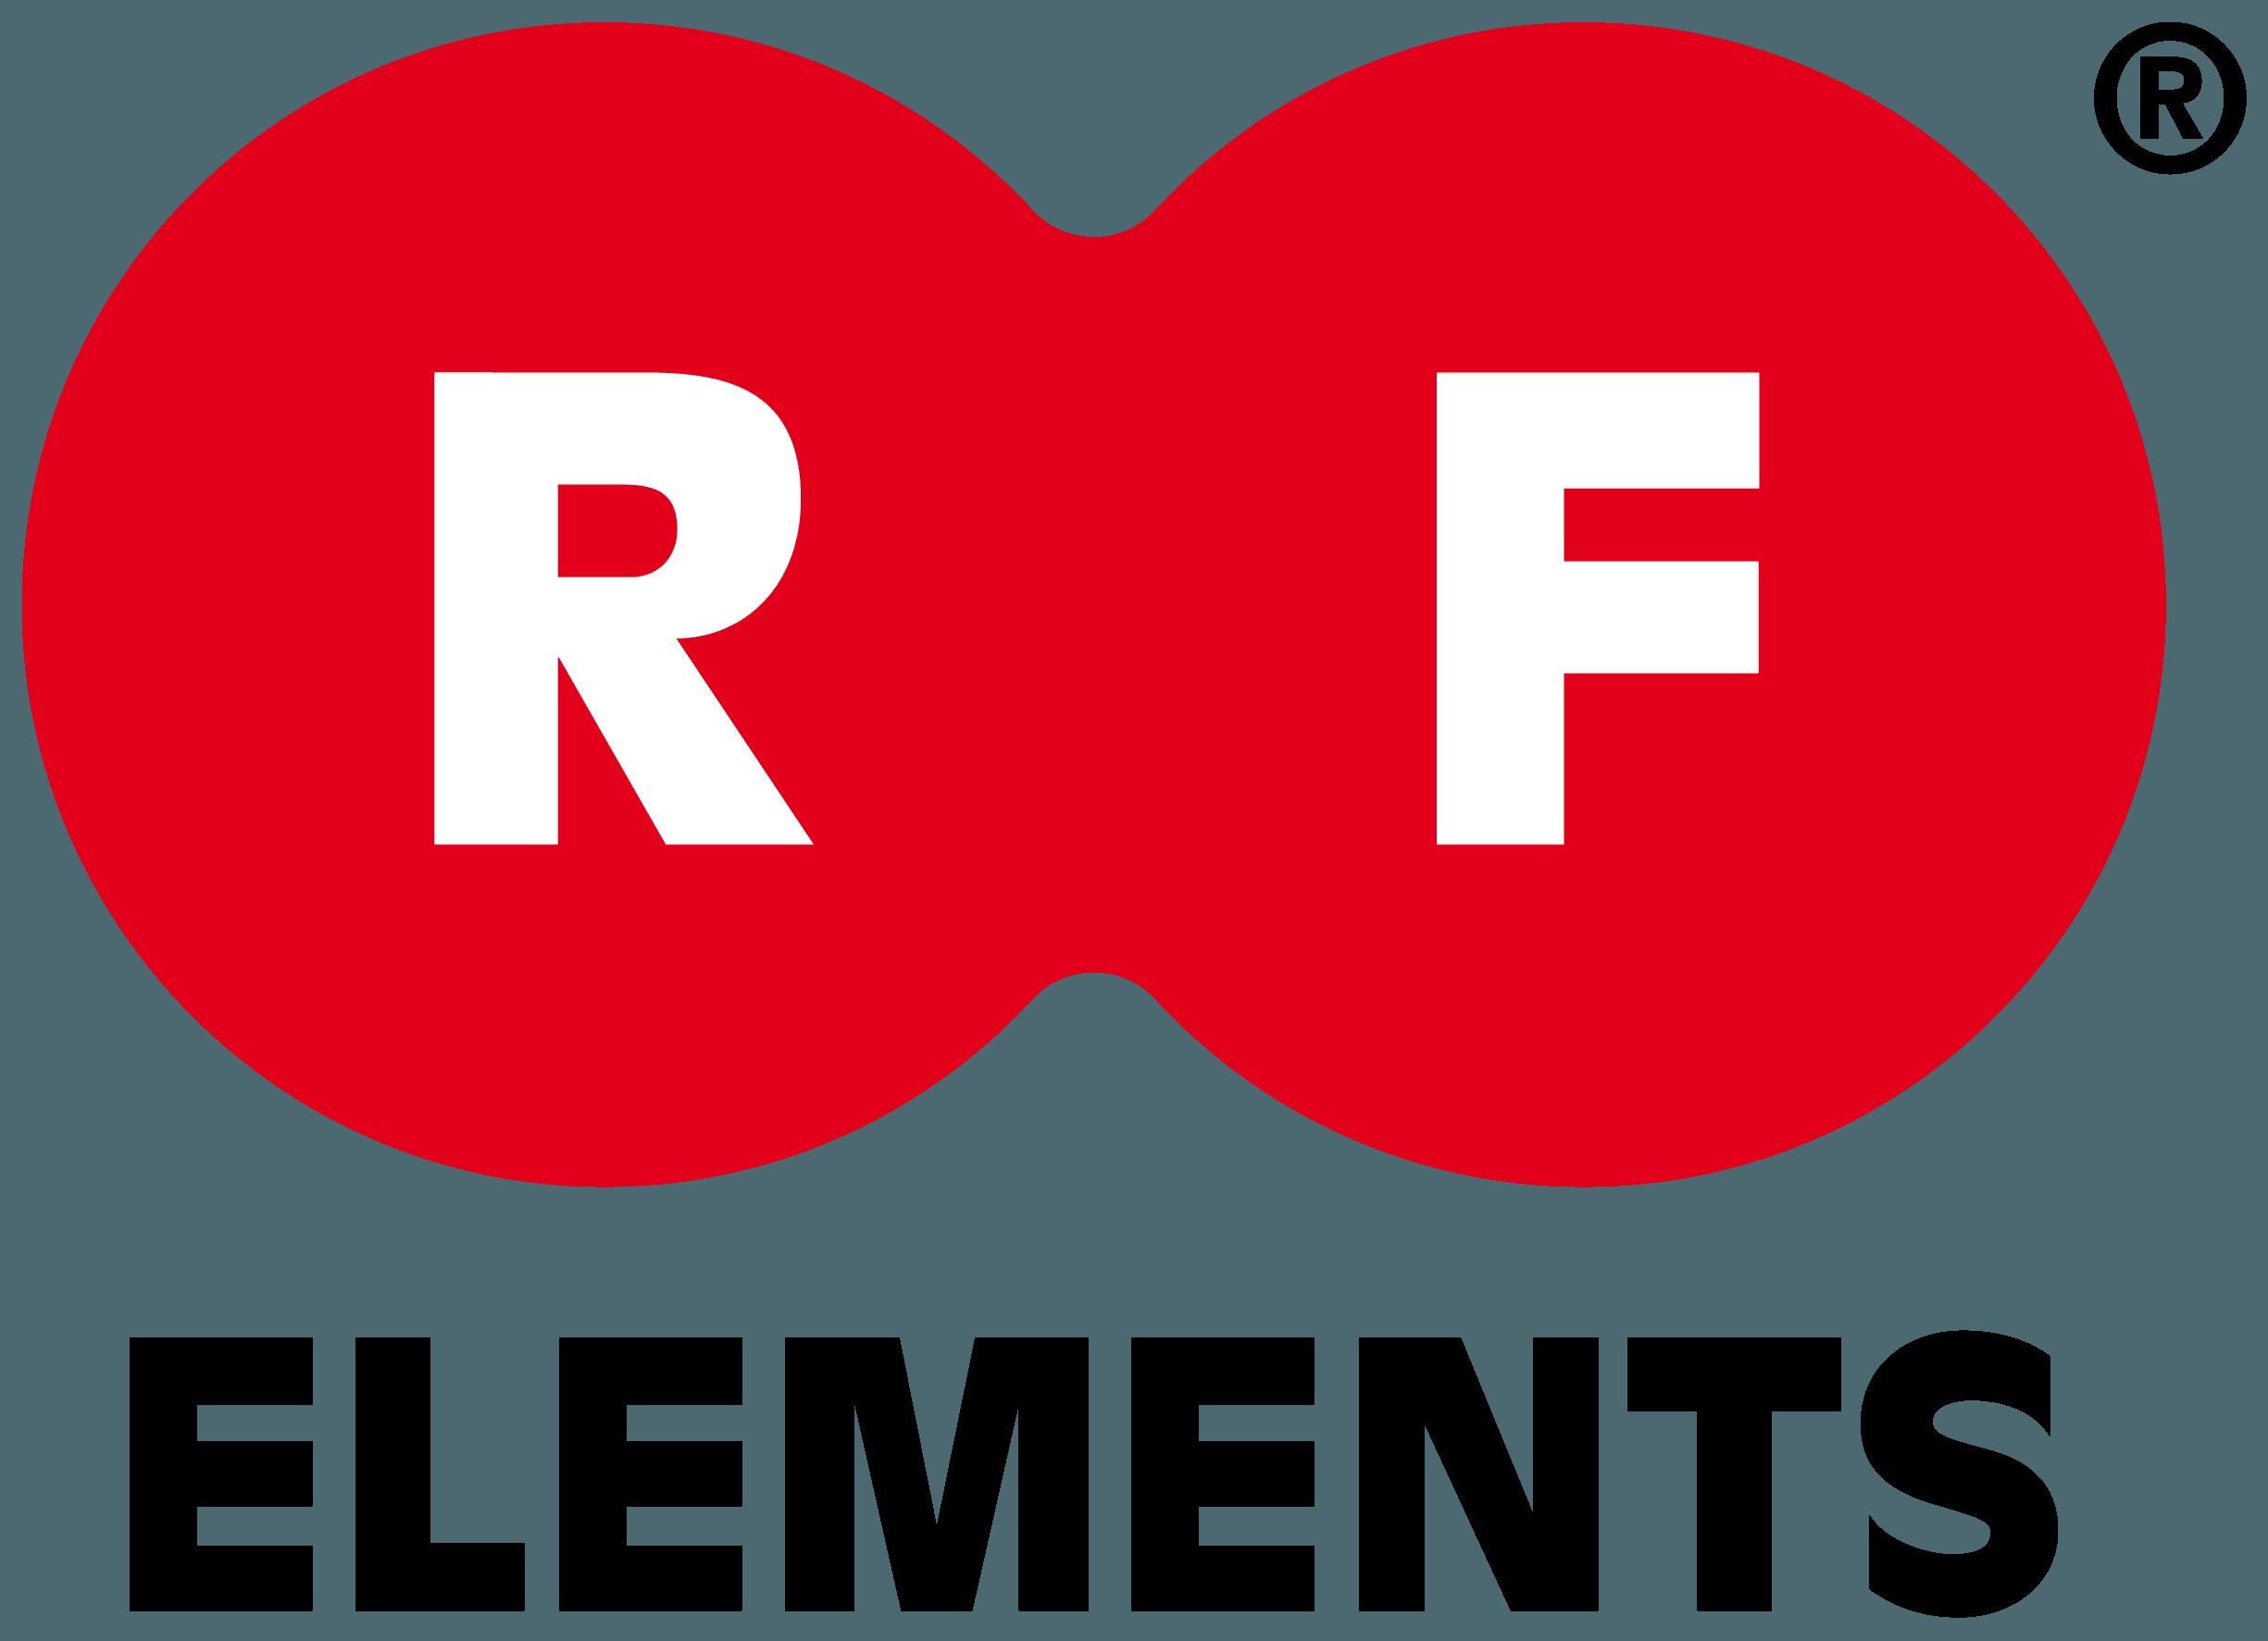 RF-elements_Vertical_Color